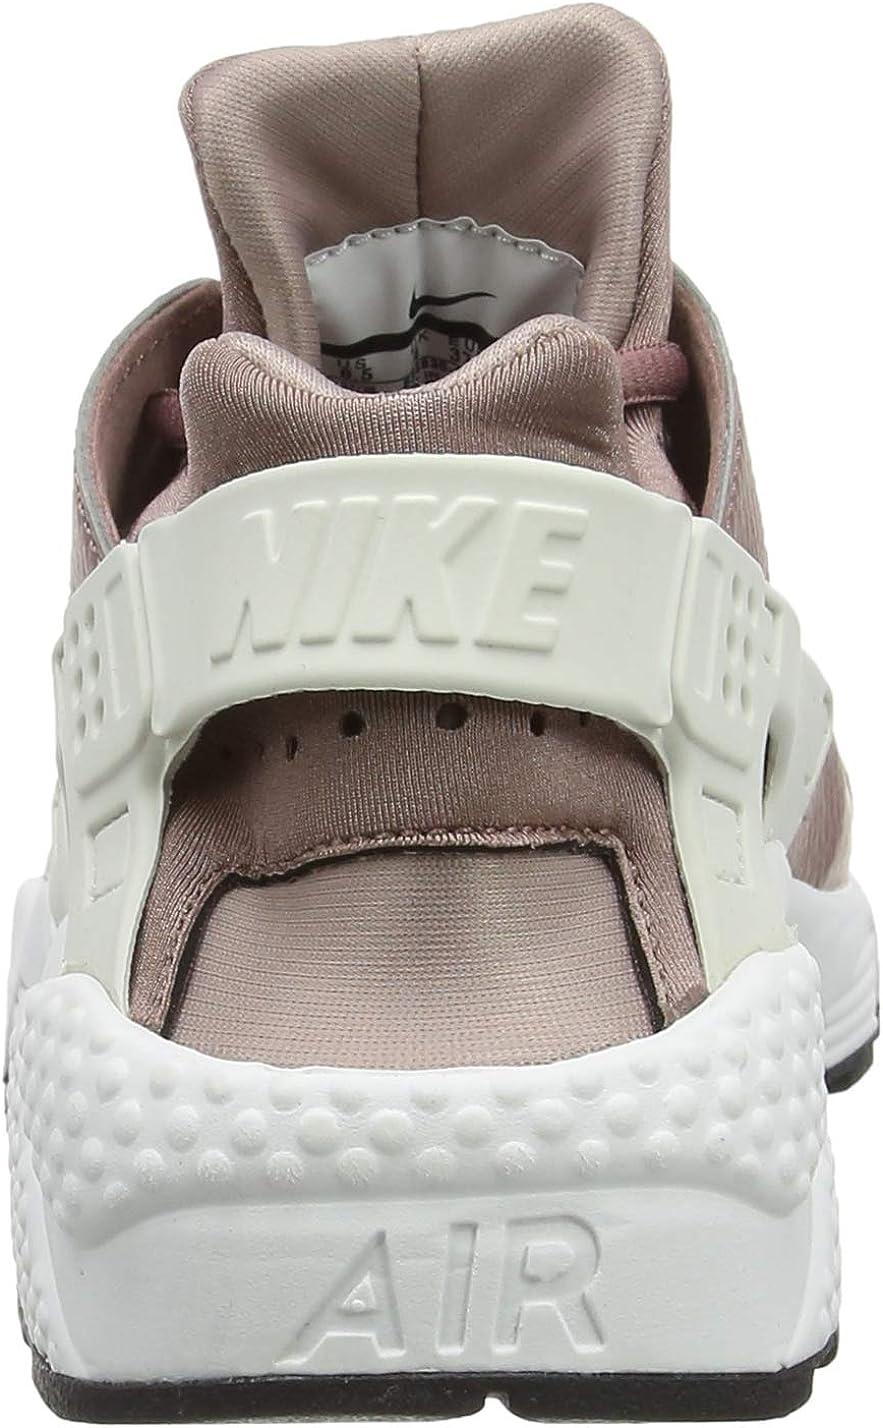 Nike Damen Air Huarache Run Gummistiefel, Schwarz, 40 EU Mehrfarbig Smokey Mauve Summit White Diffused Taupe 203